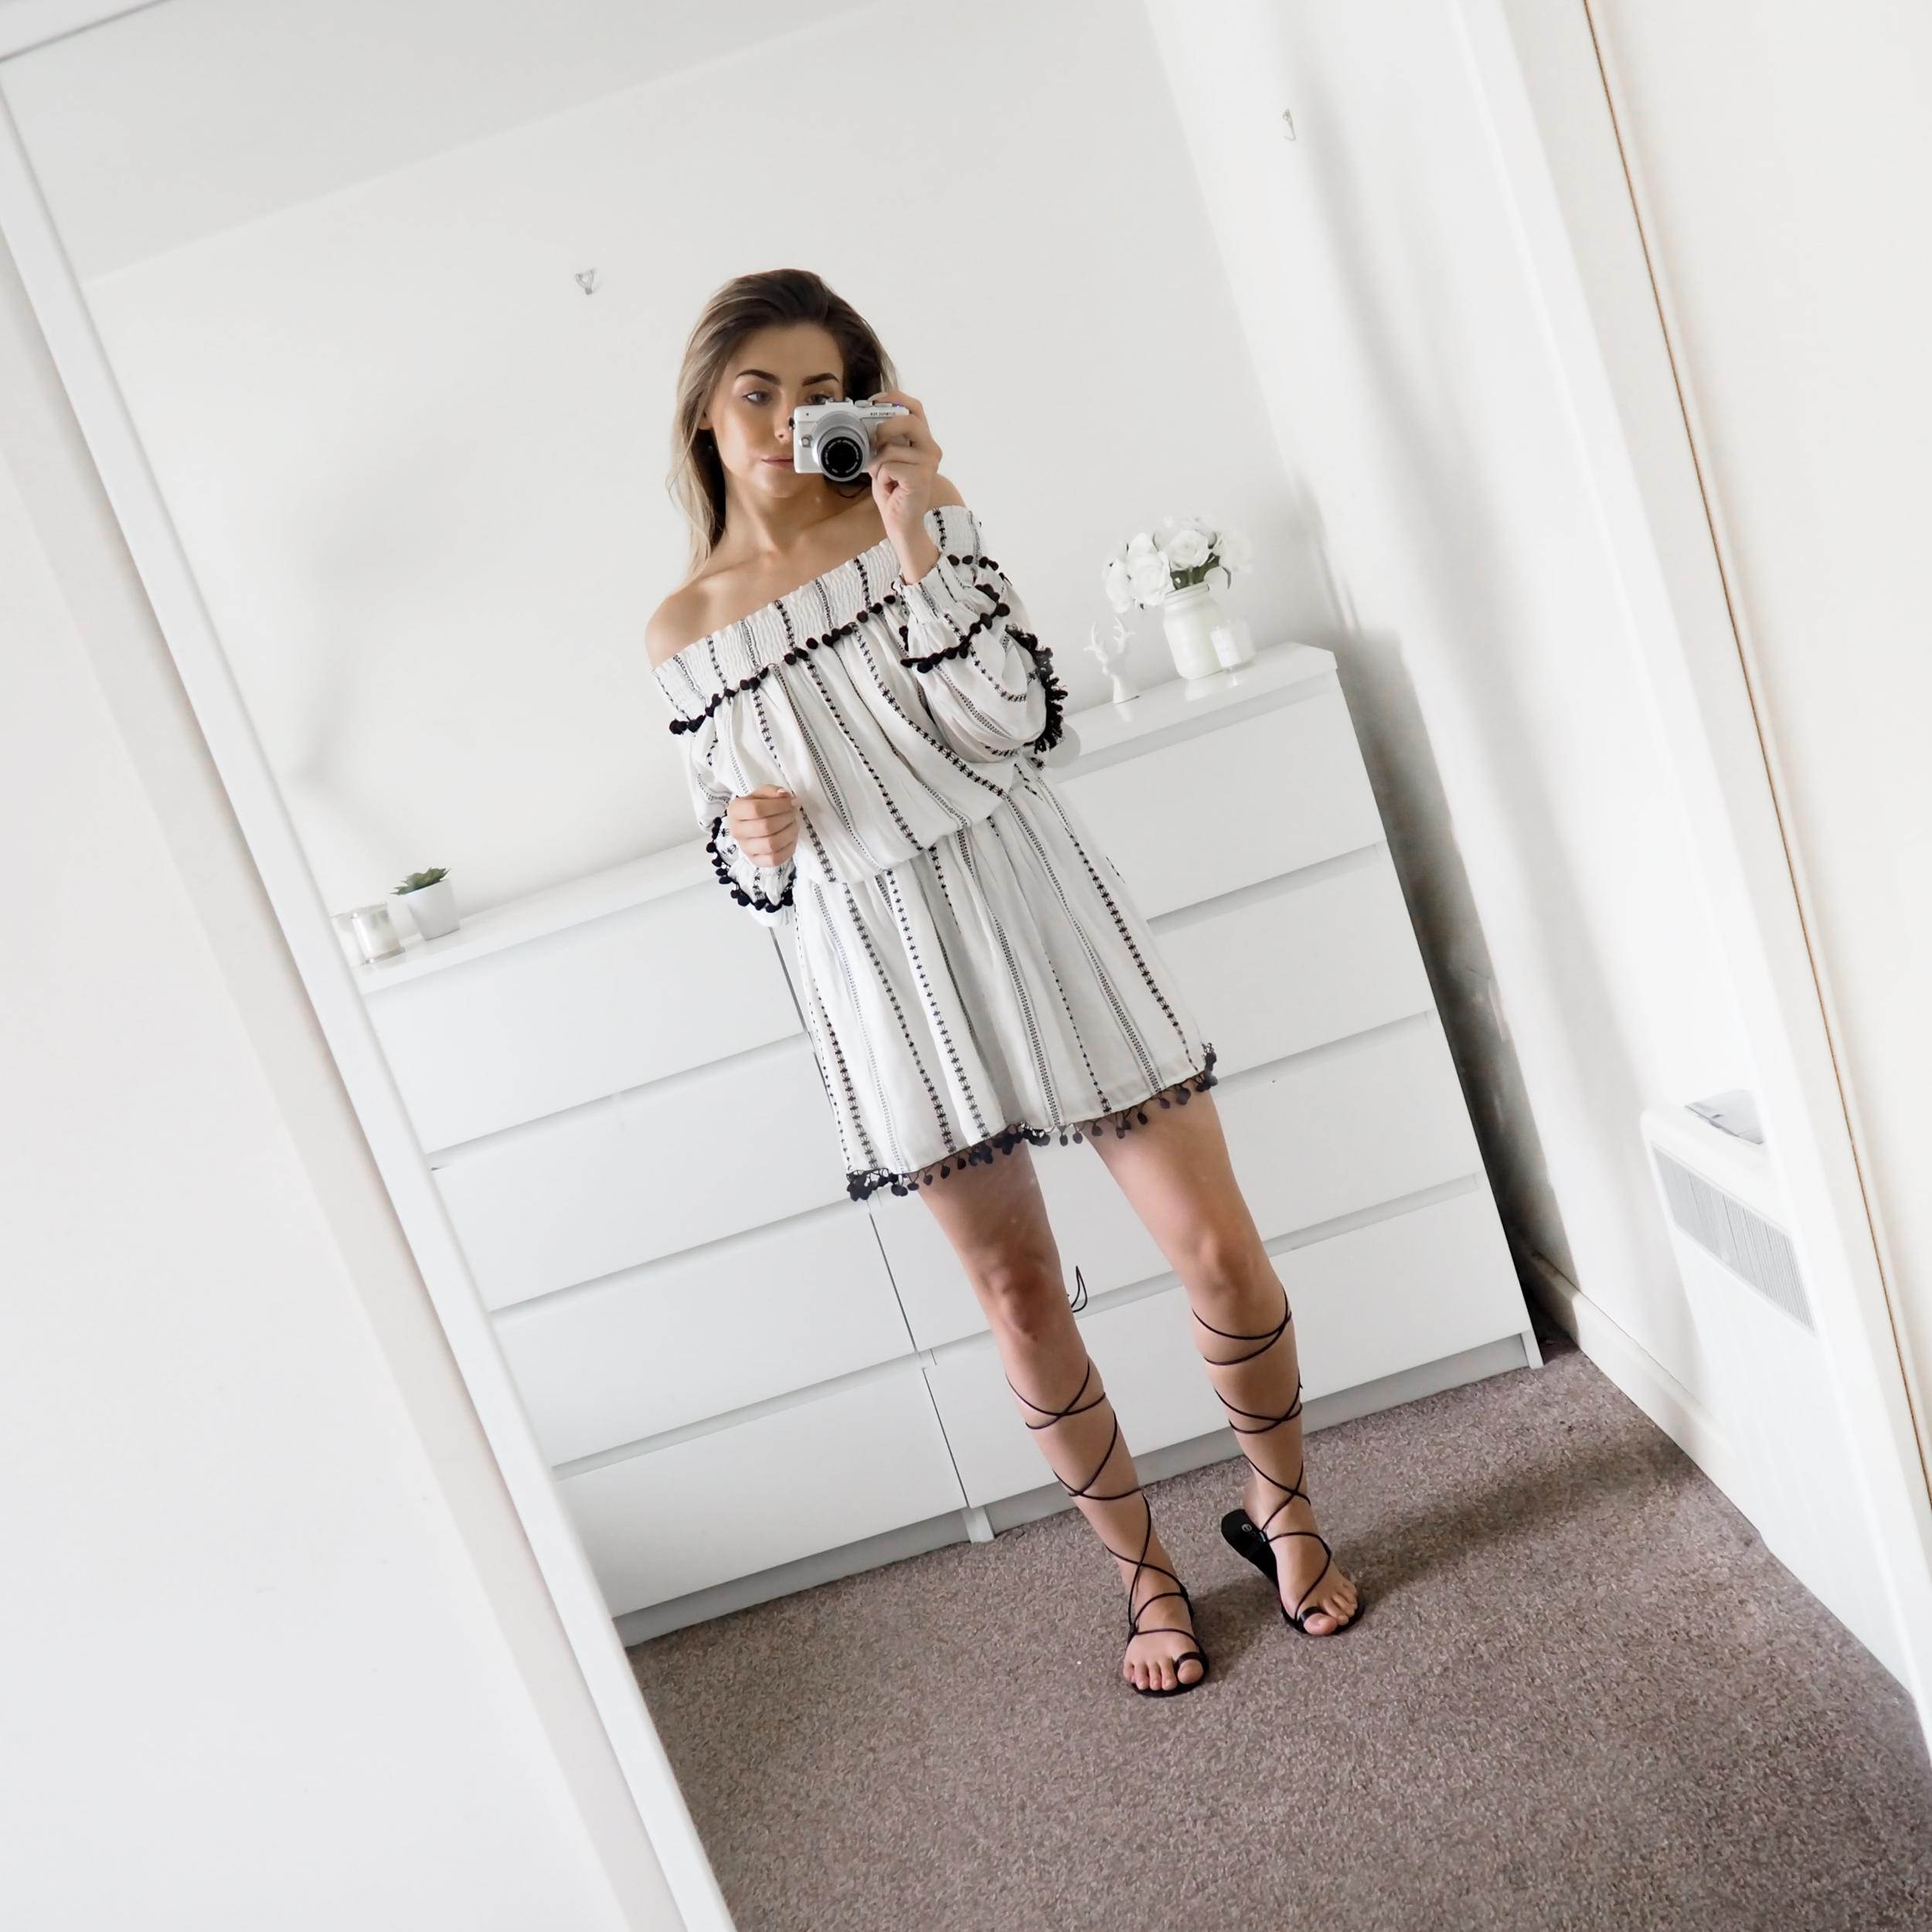 revolve-dress-outfit.jpg